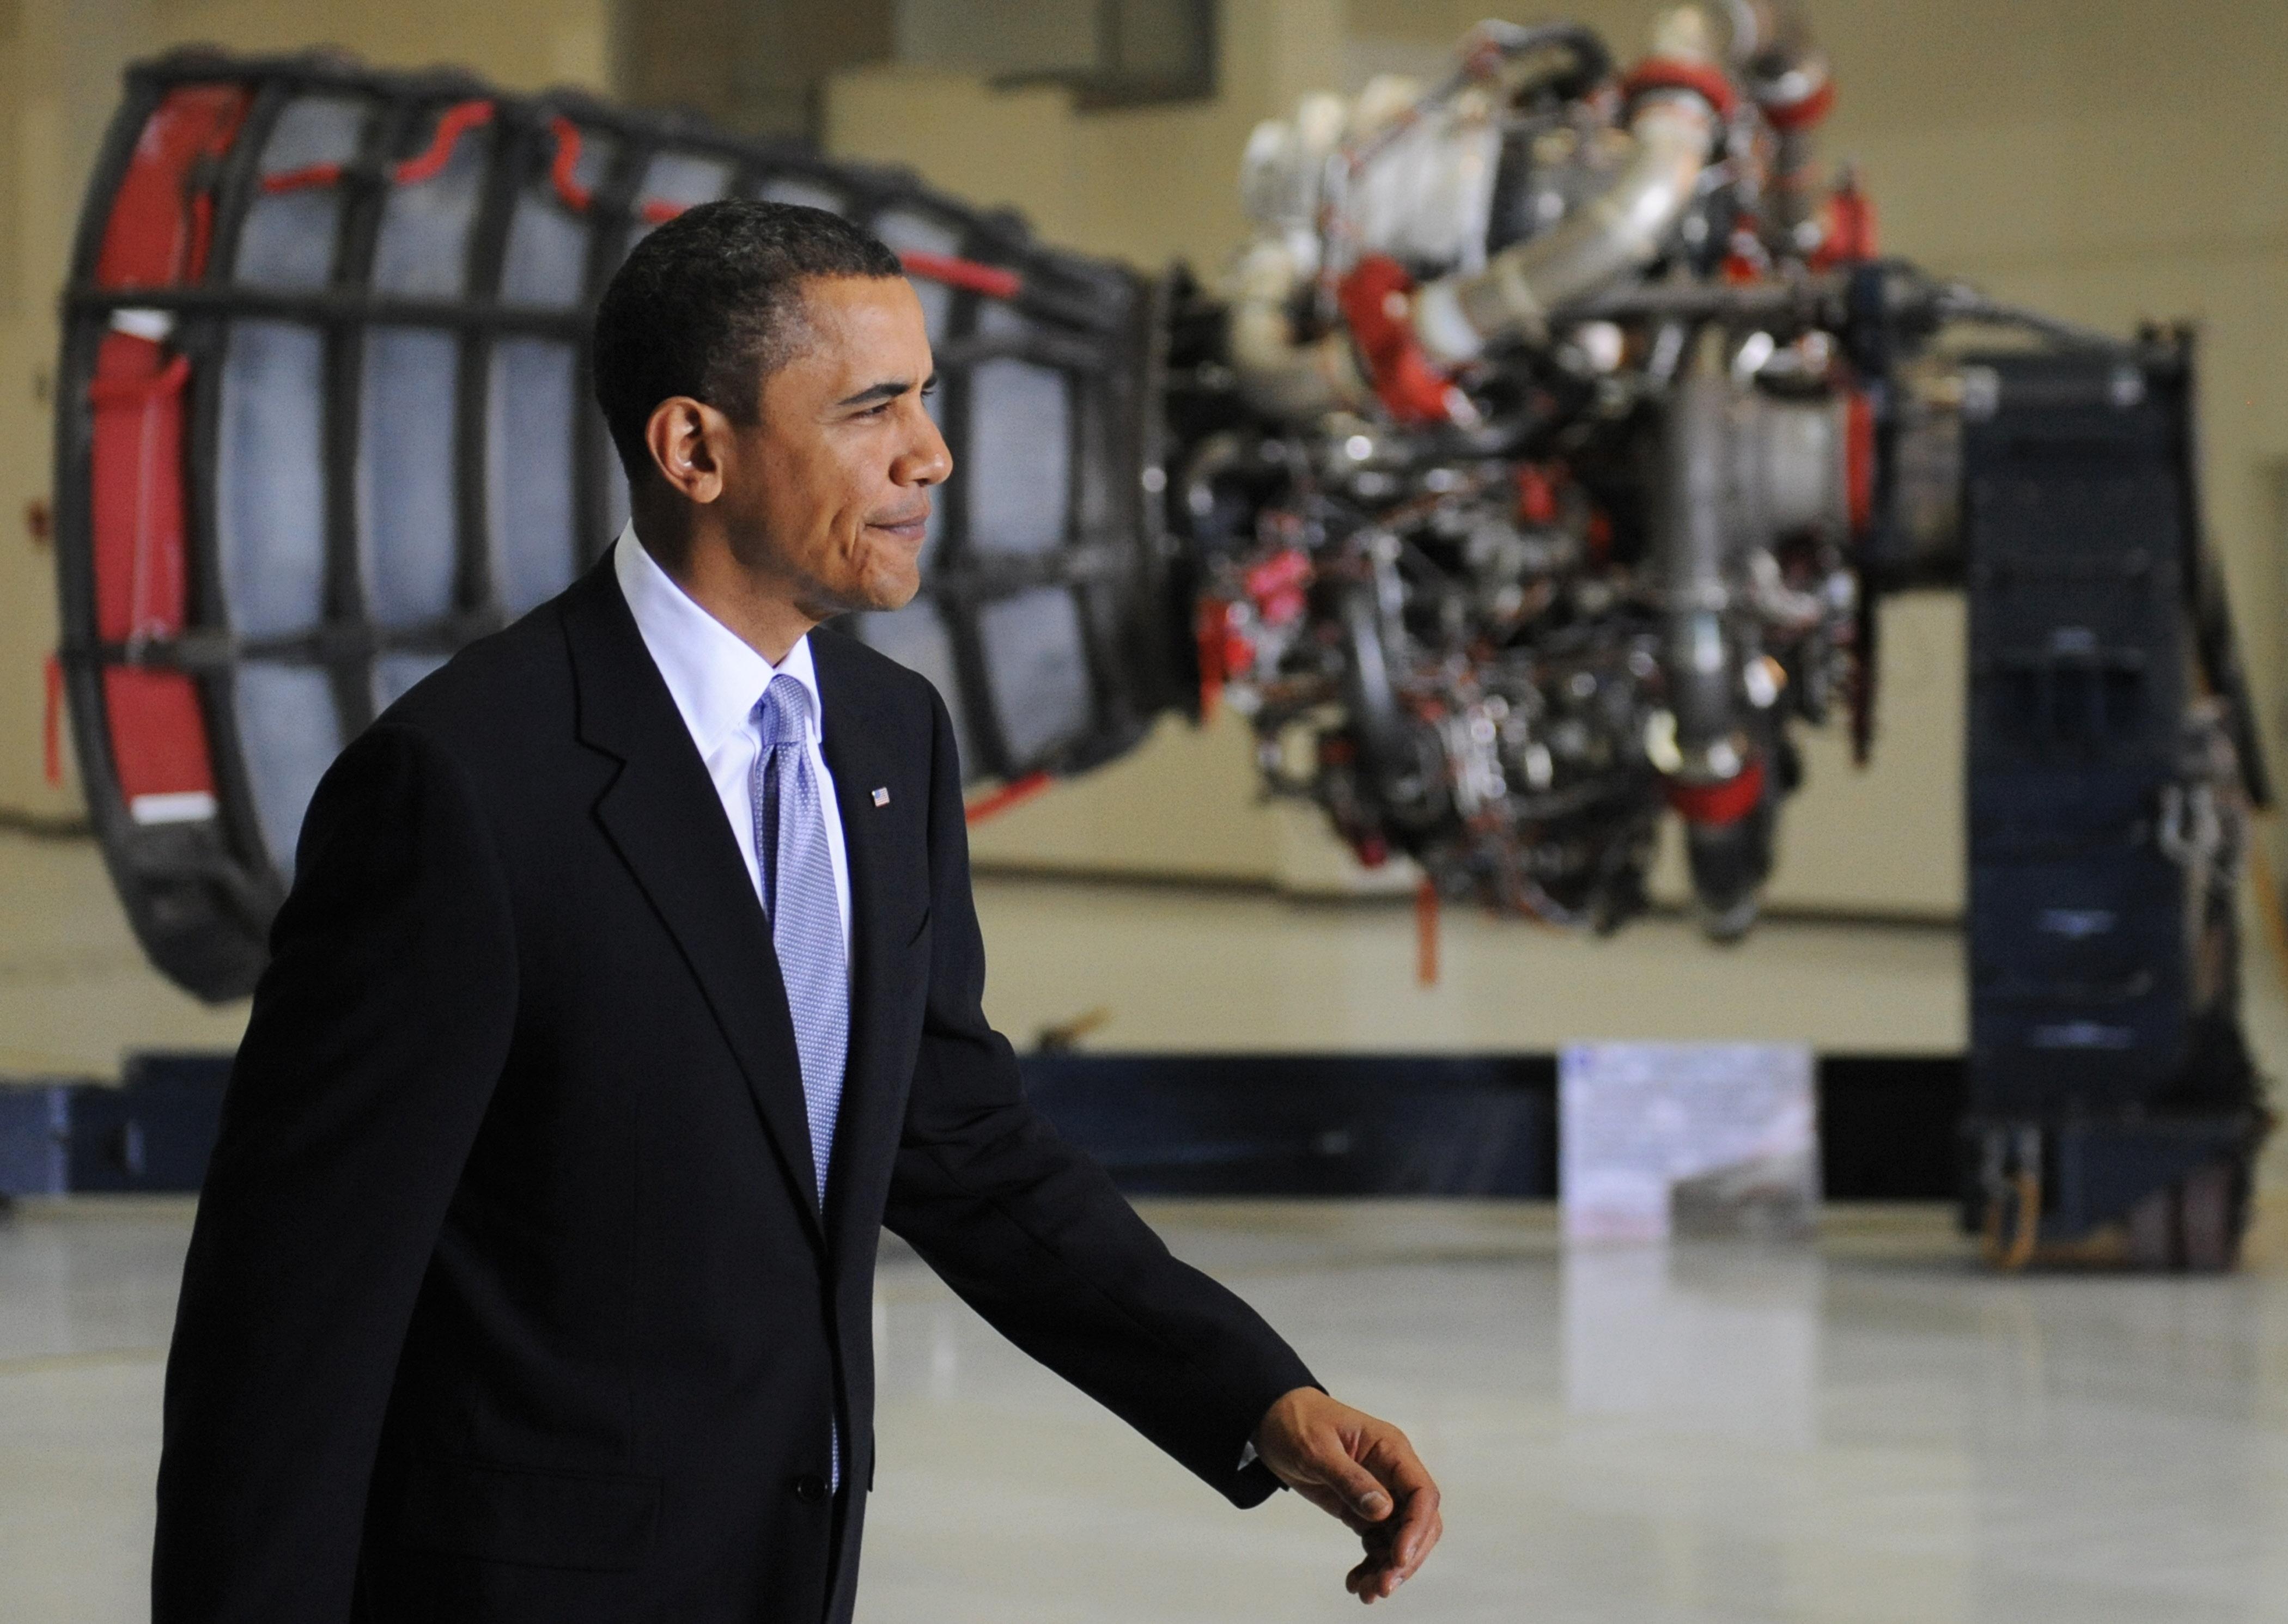 US President Barack Obama walks past a m